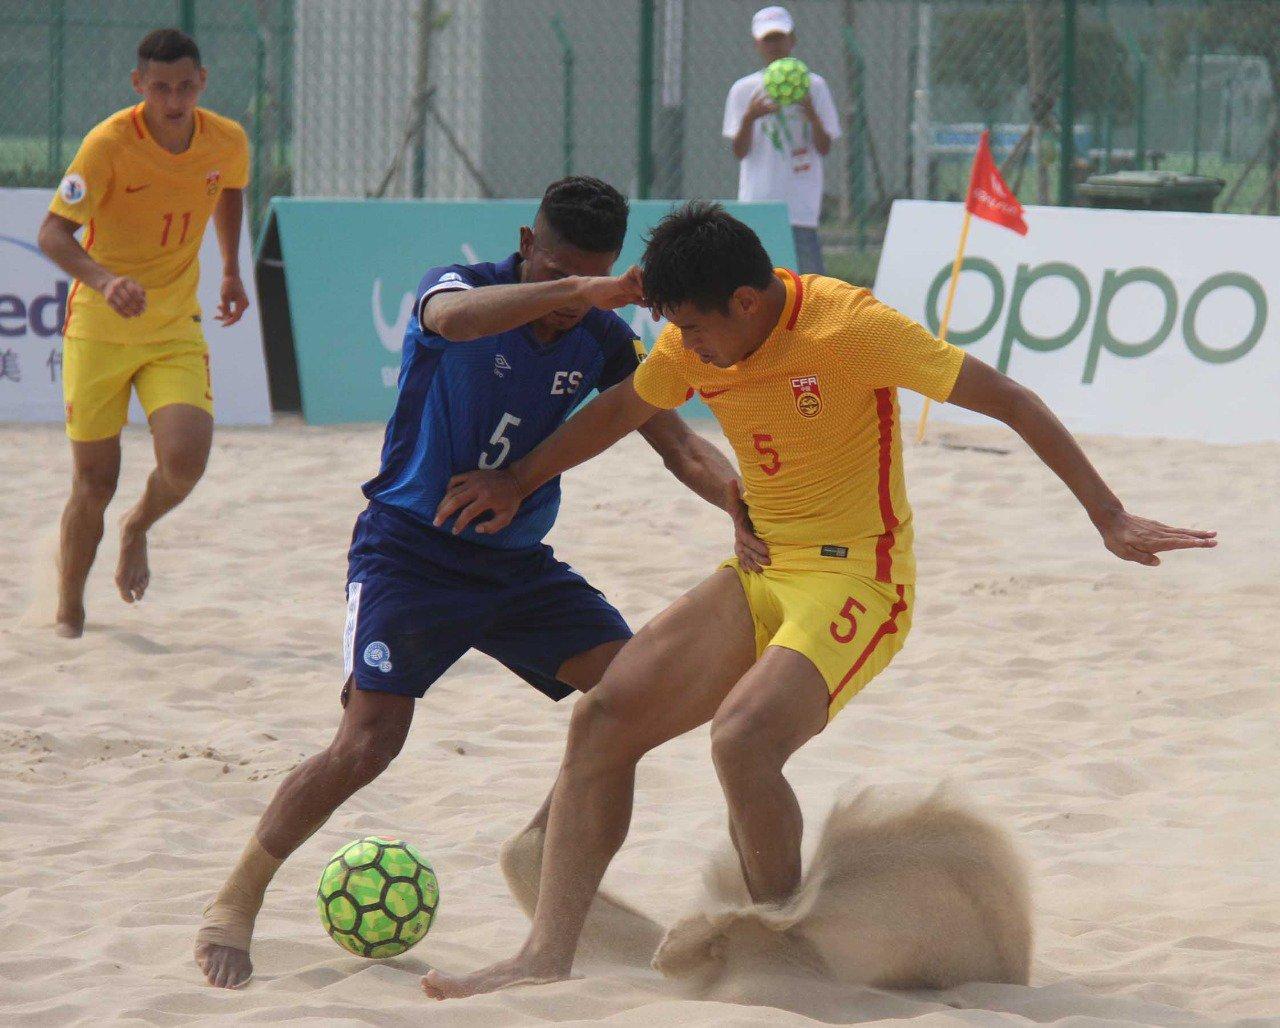 2019 Goalfun CFA China - Latino America Futbol Playa campeonato. EEBbV6UX4AEA9NM?format=jpg&name=large